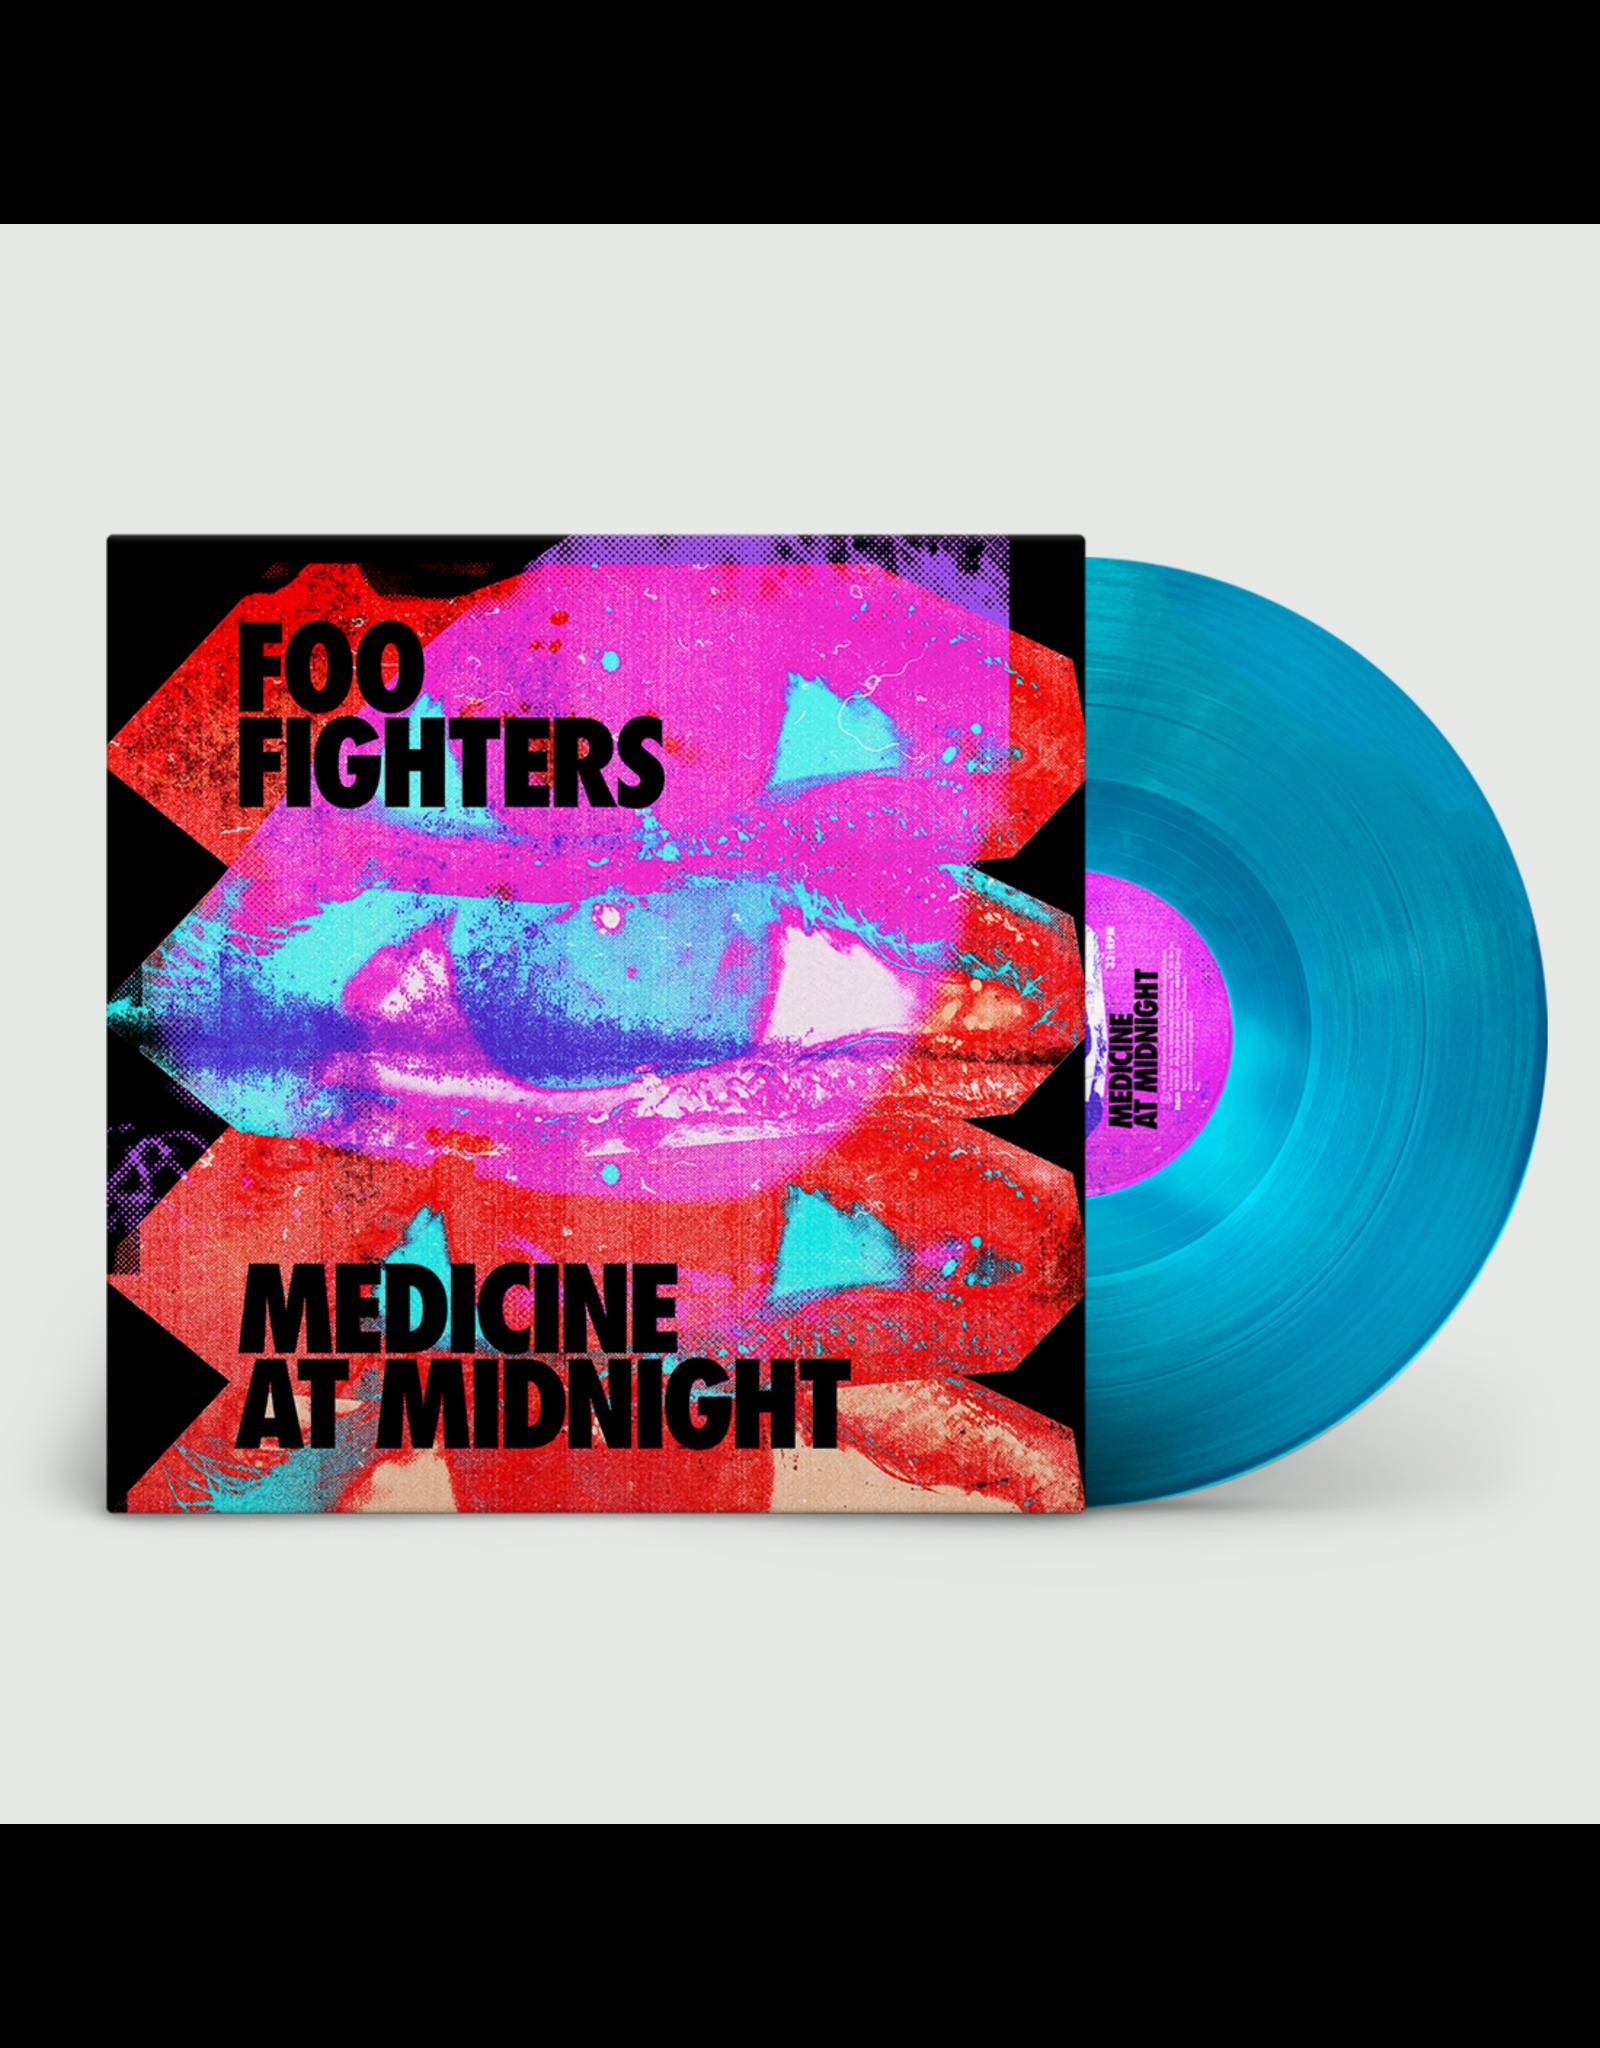 Foo Fighters - Medicine At Midnight (Exclusive Blue Vinyl)